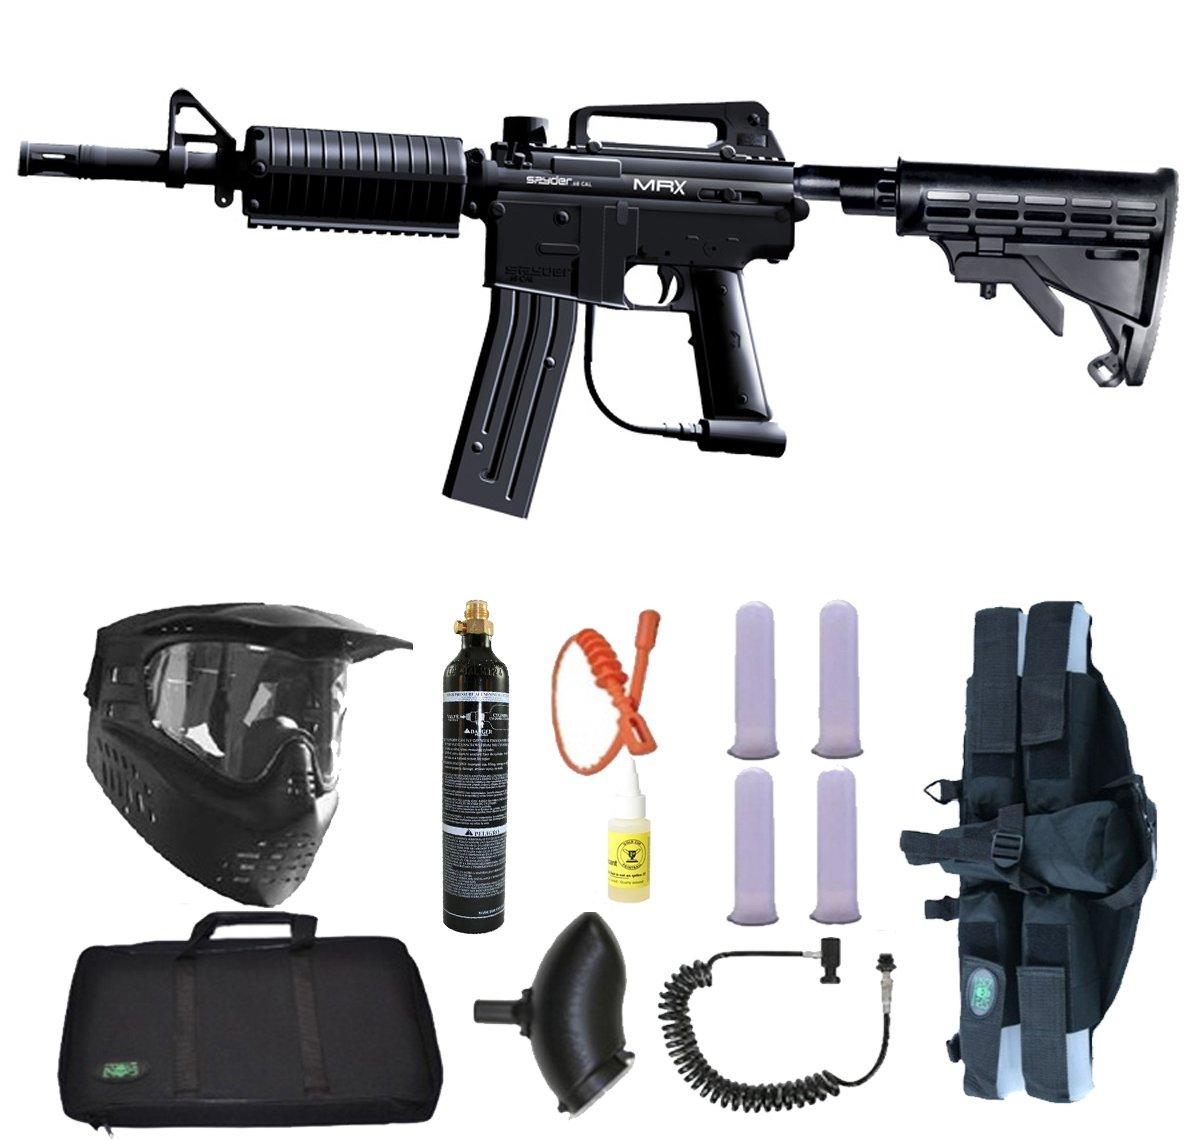 Spyder MRX Magazine Fed Paintball Marker Gun 4+1 9oz Sniper Set